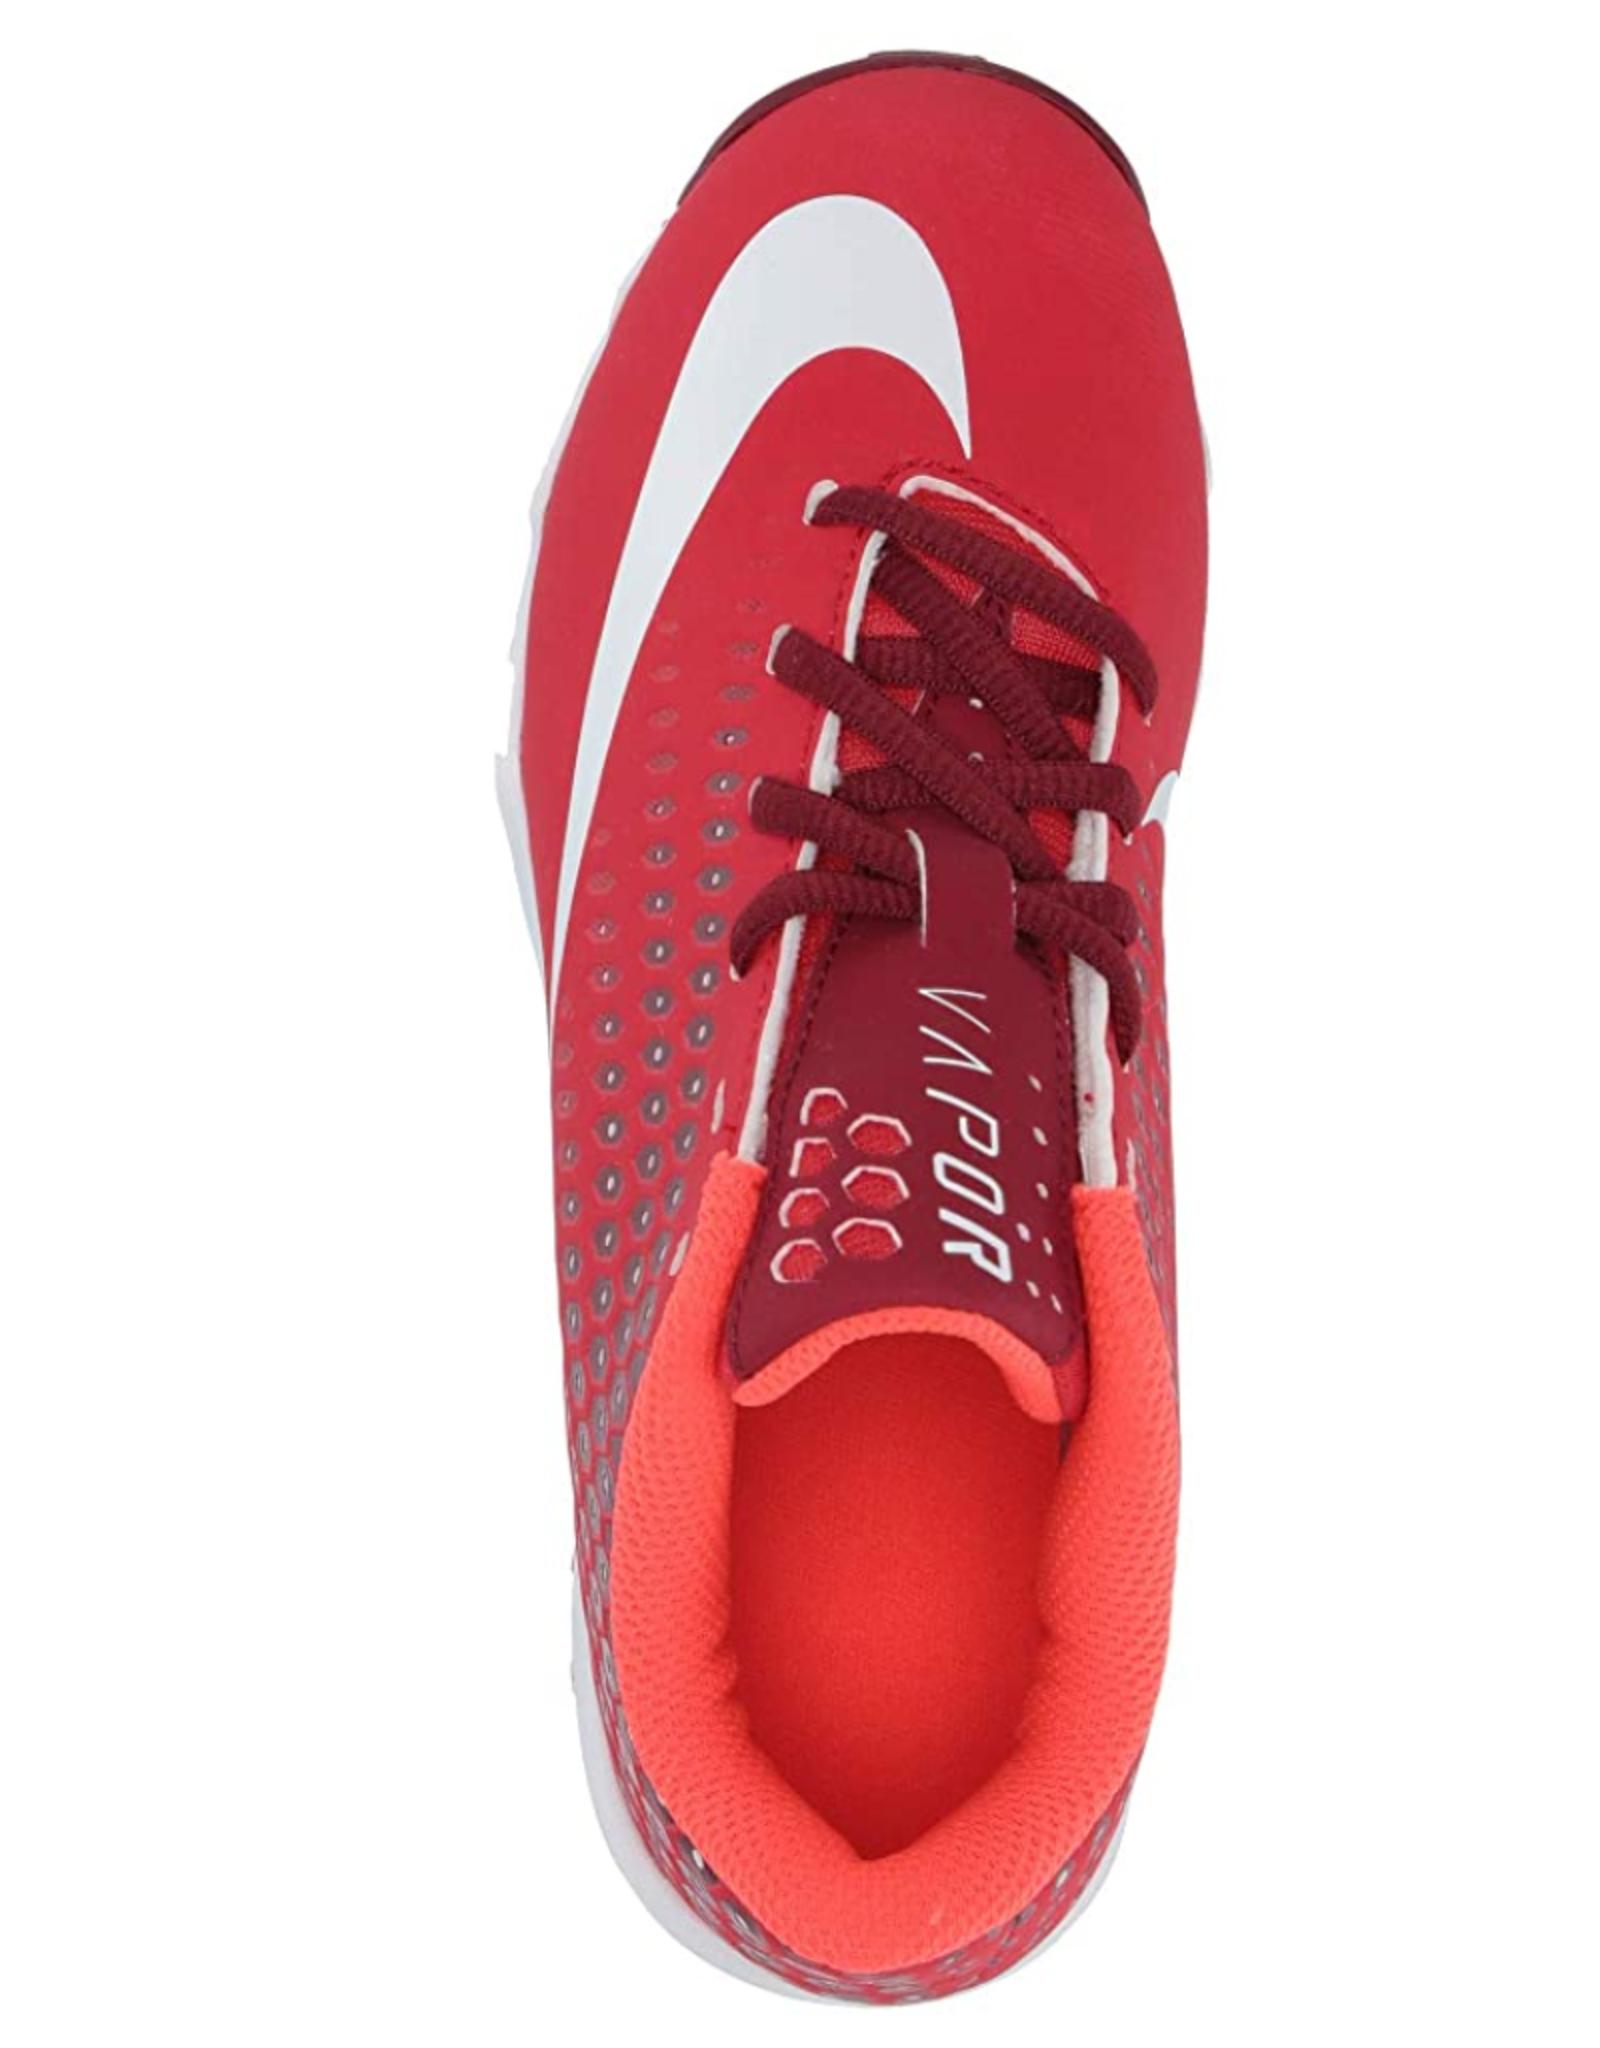 Nike Youth Vapor Ultrafly Keystone Baseball Cleats Red